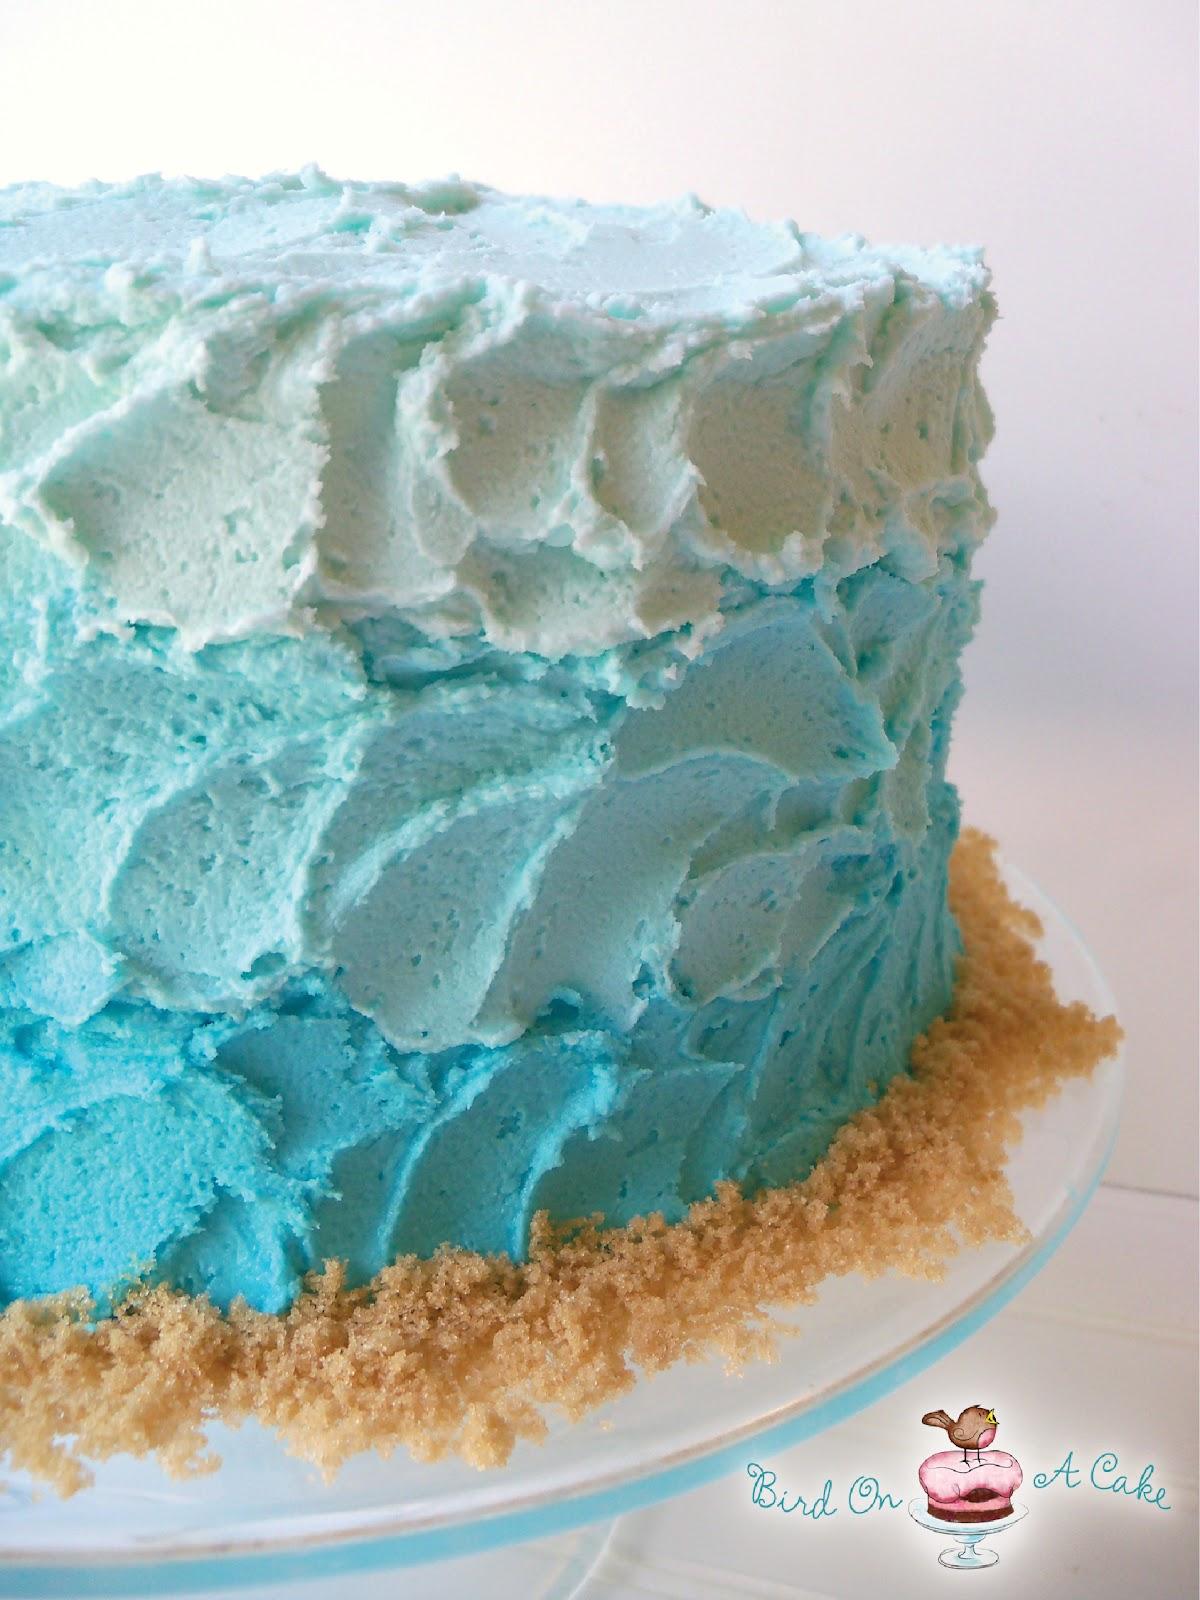 Bird On A Cake Ombre Beach Cake With Sand Dollars